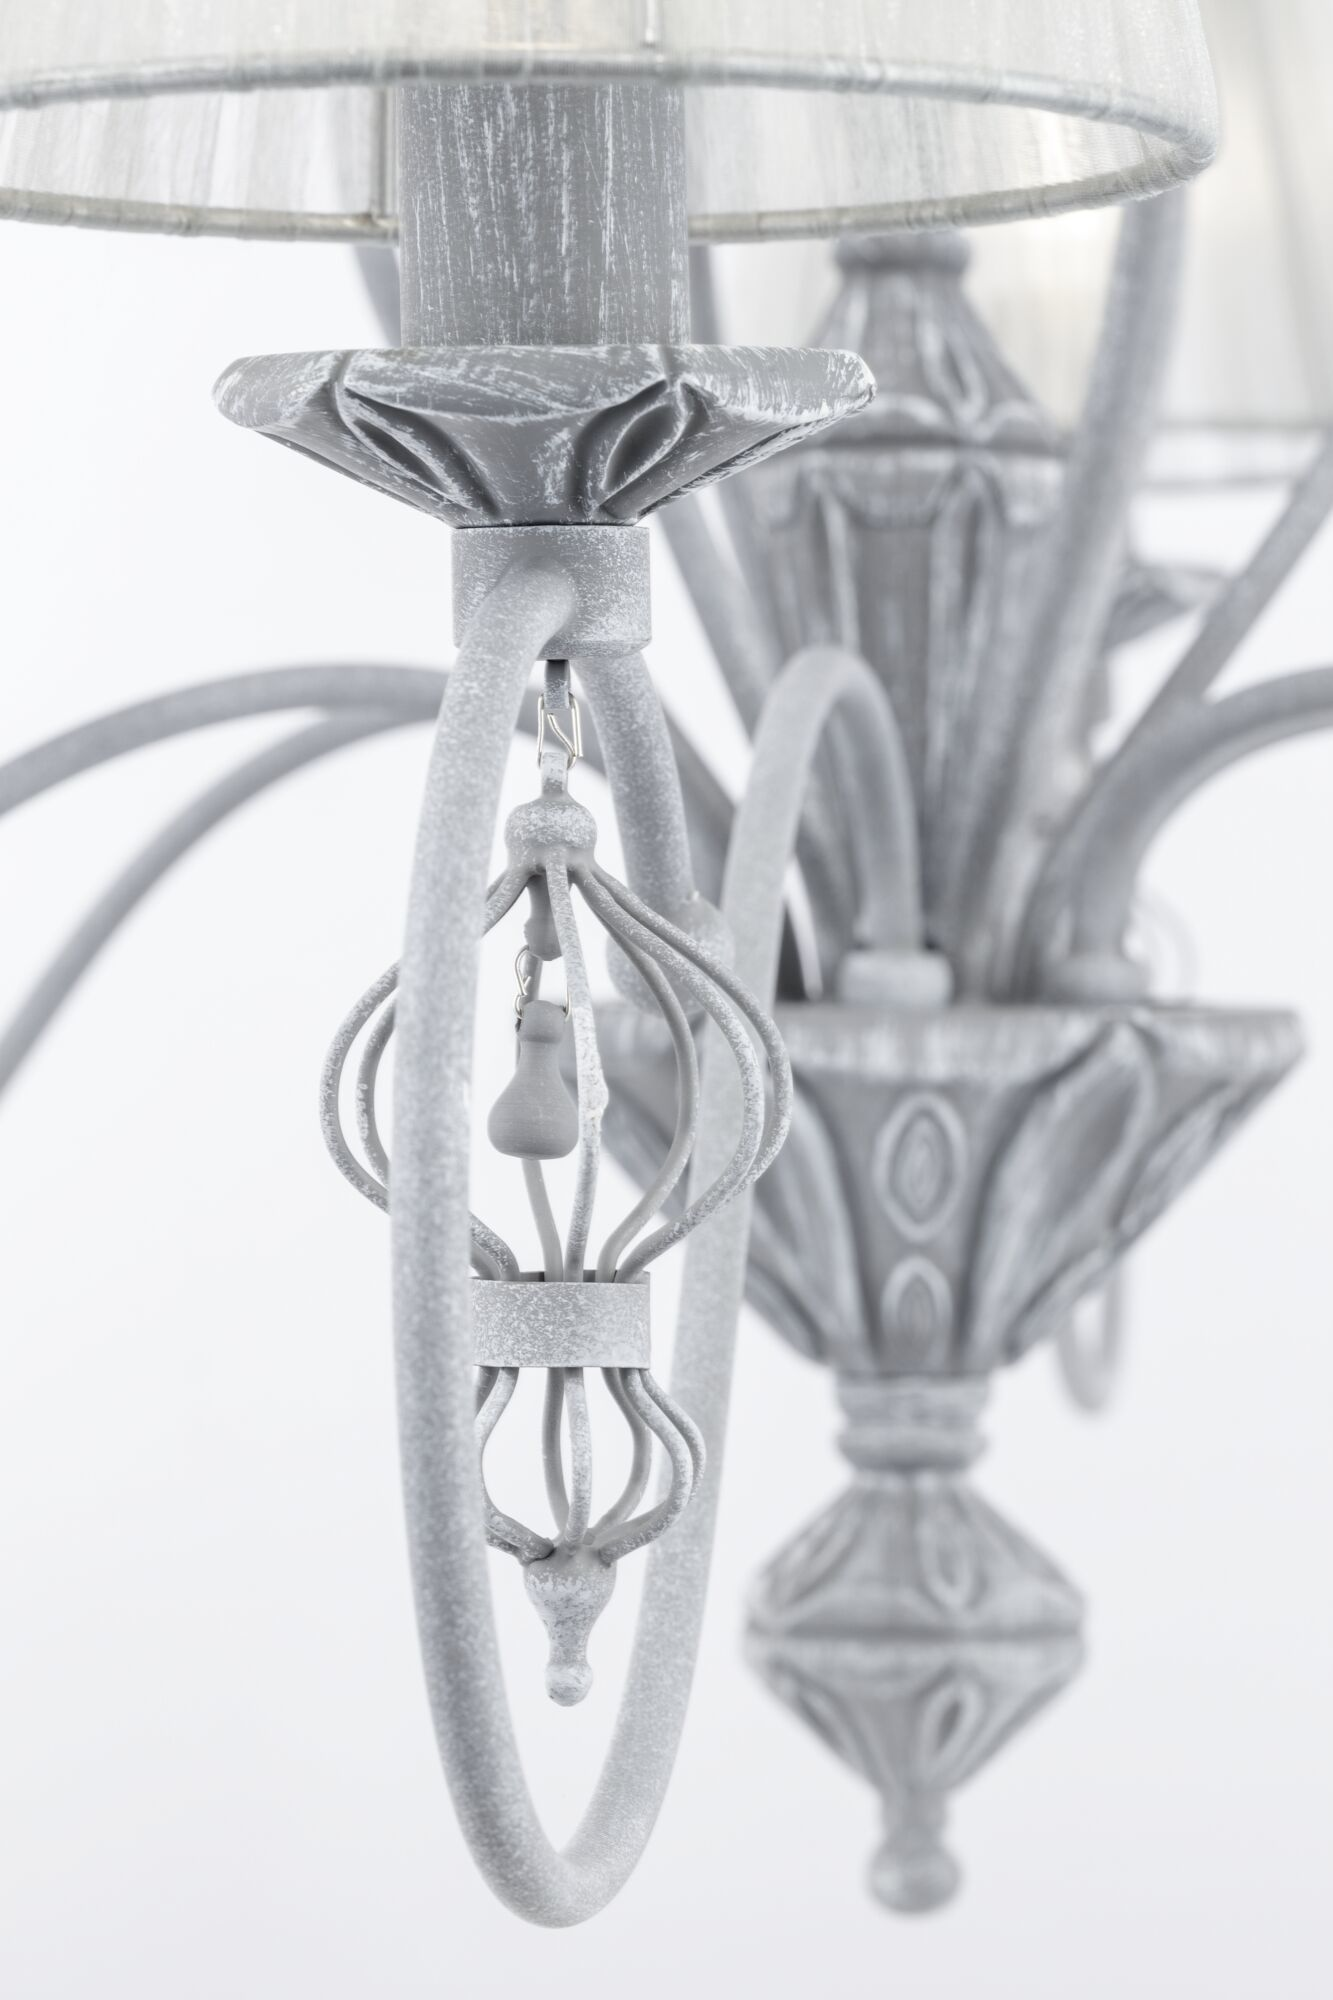 Потолочно-подвесная люстра Maytoni Classic Elegant Monsoon ARM154-06-S, 6xE14x40W, серый, металл, текстиль - фото 4